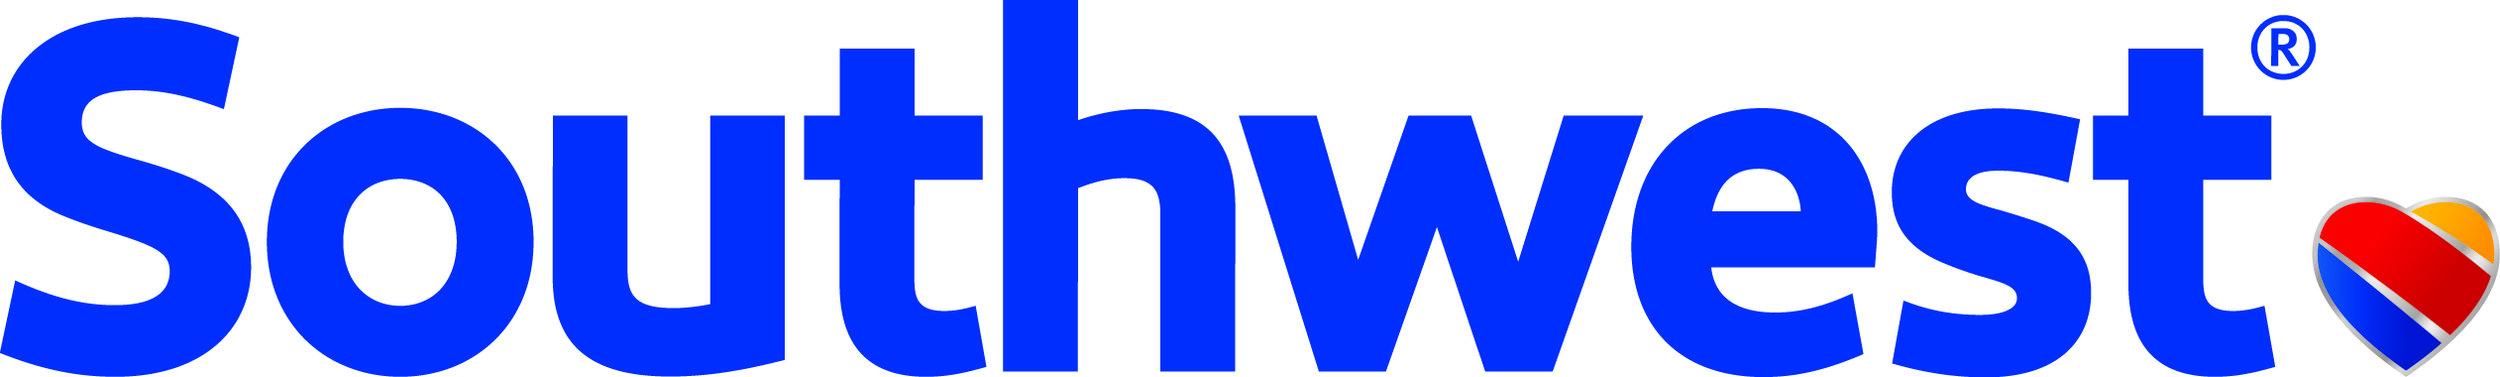 Logo-1-Southwest_cmyk_print.jpg